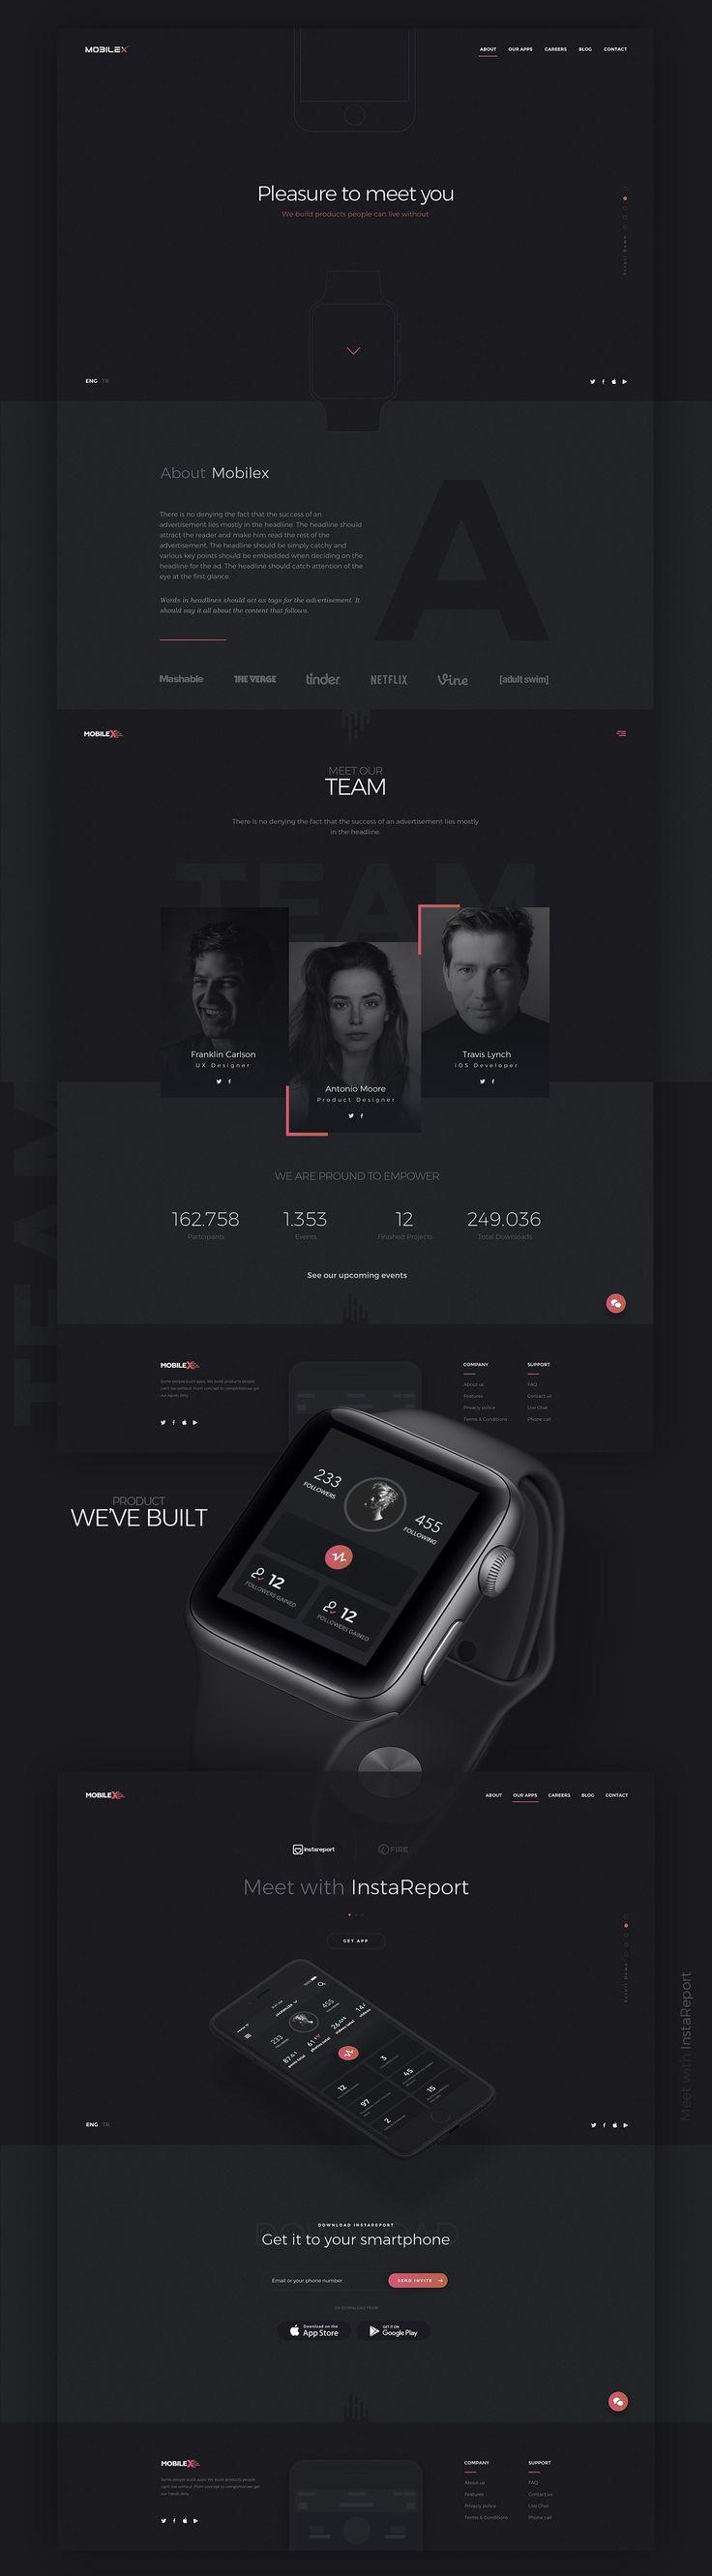 Website creation for Mobilex on Behance